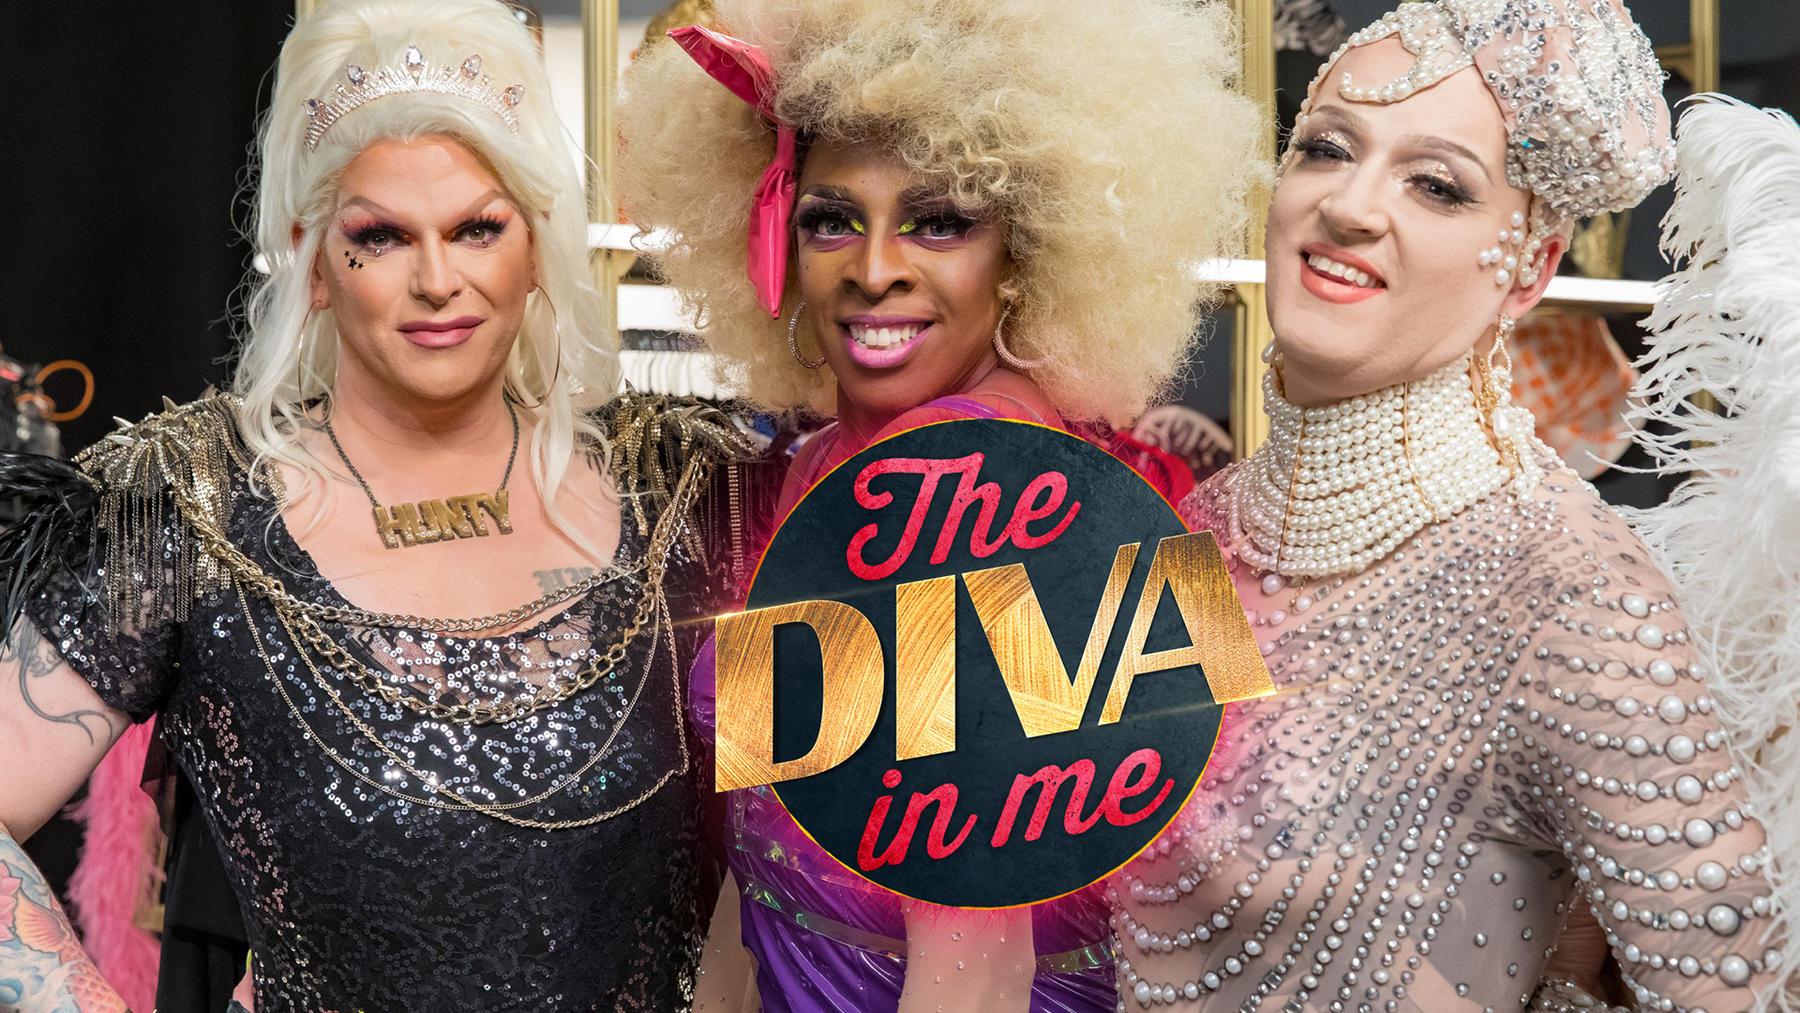 Trailer: The Diva in me